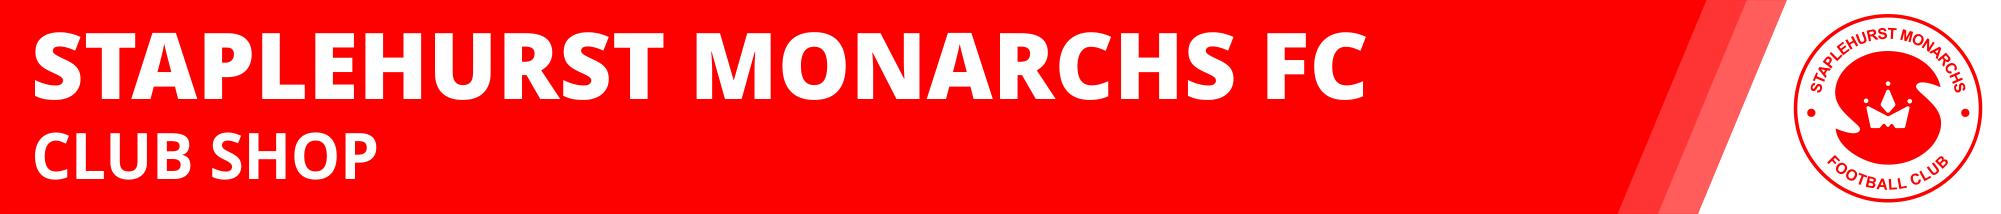 staplehurst-monarchs-fc-club-shop-banner.png